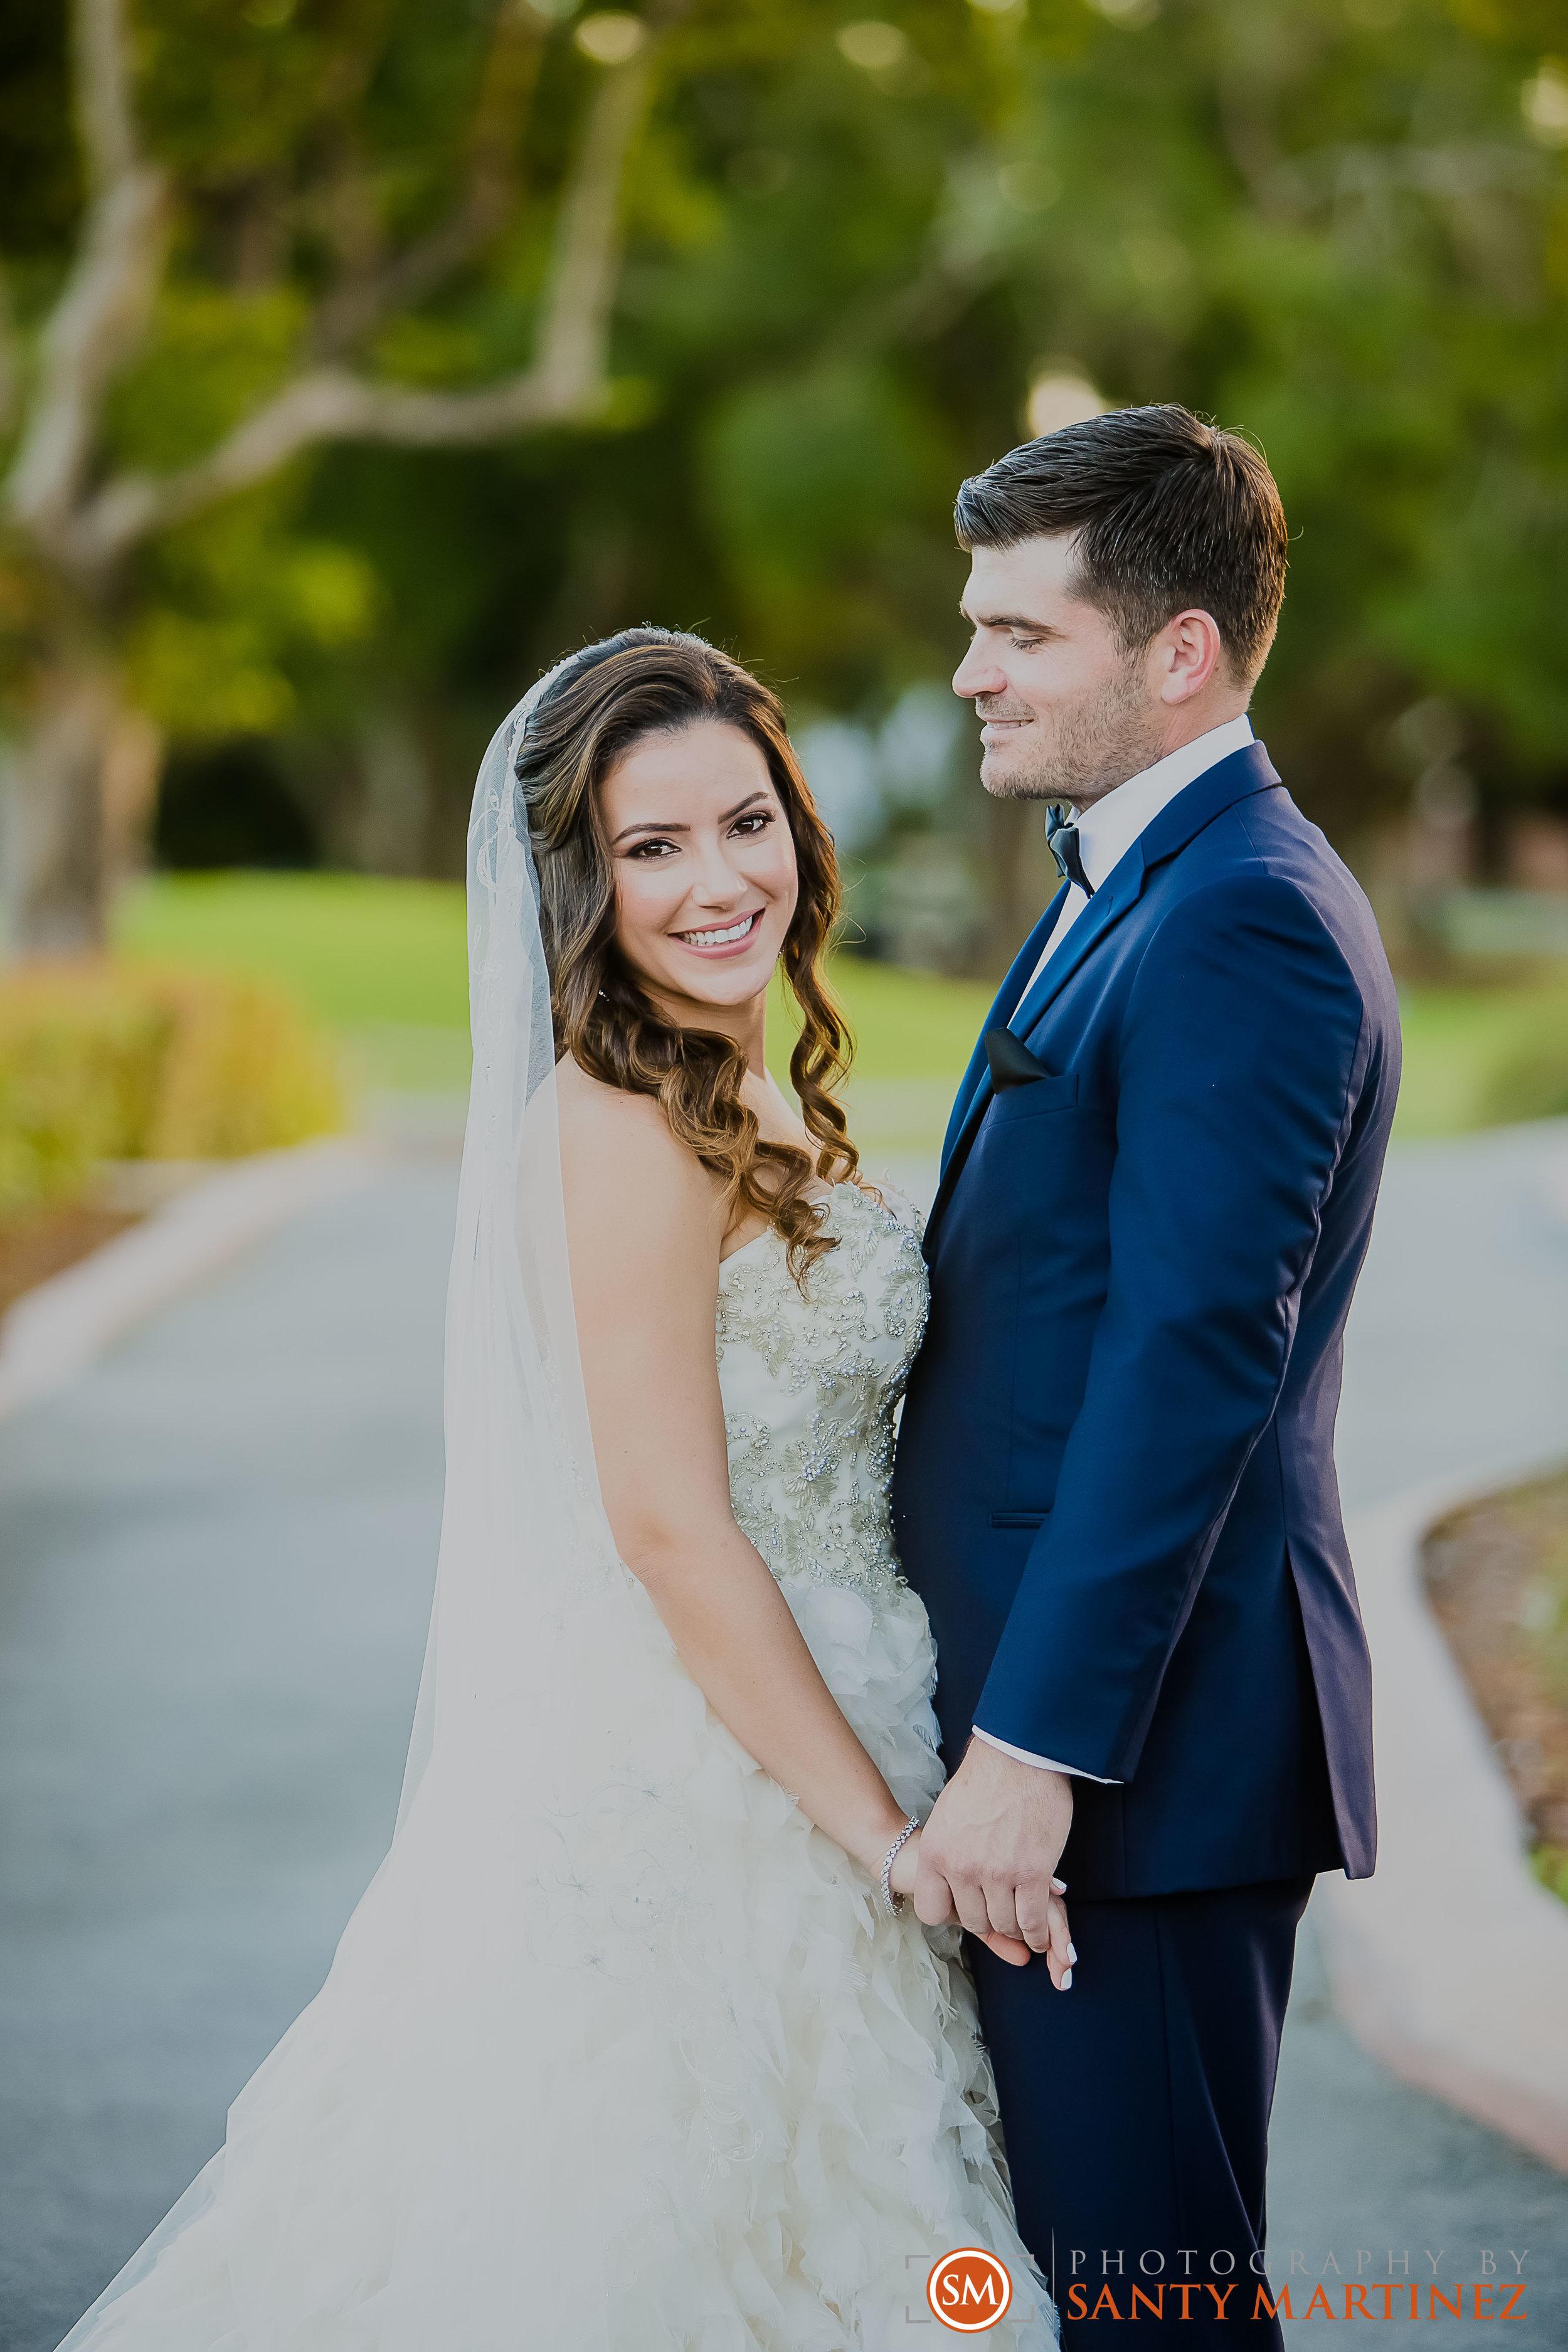 Wedding Coral Gables Country Club - Santy Martinez Photography-15.jpg